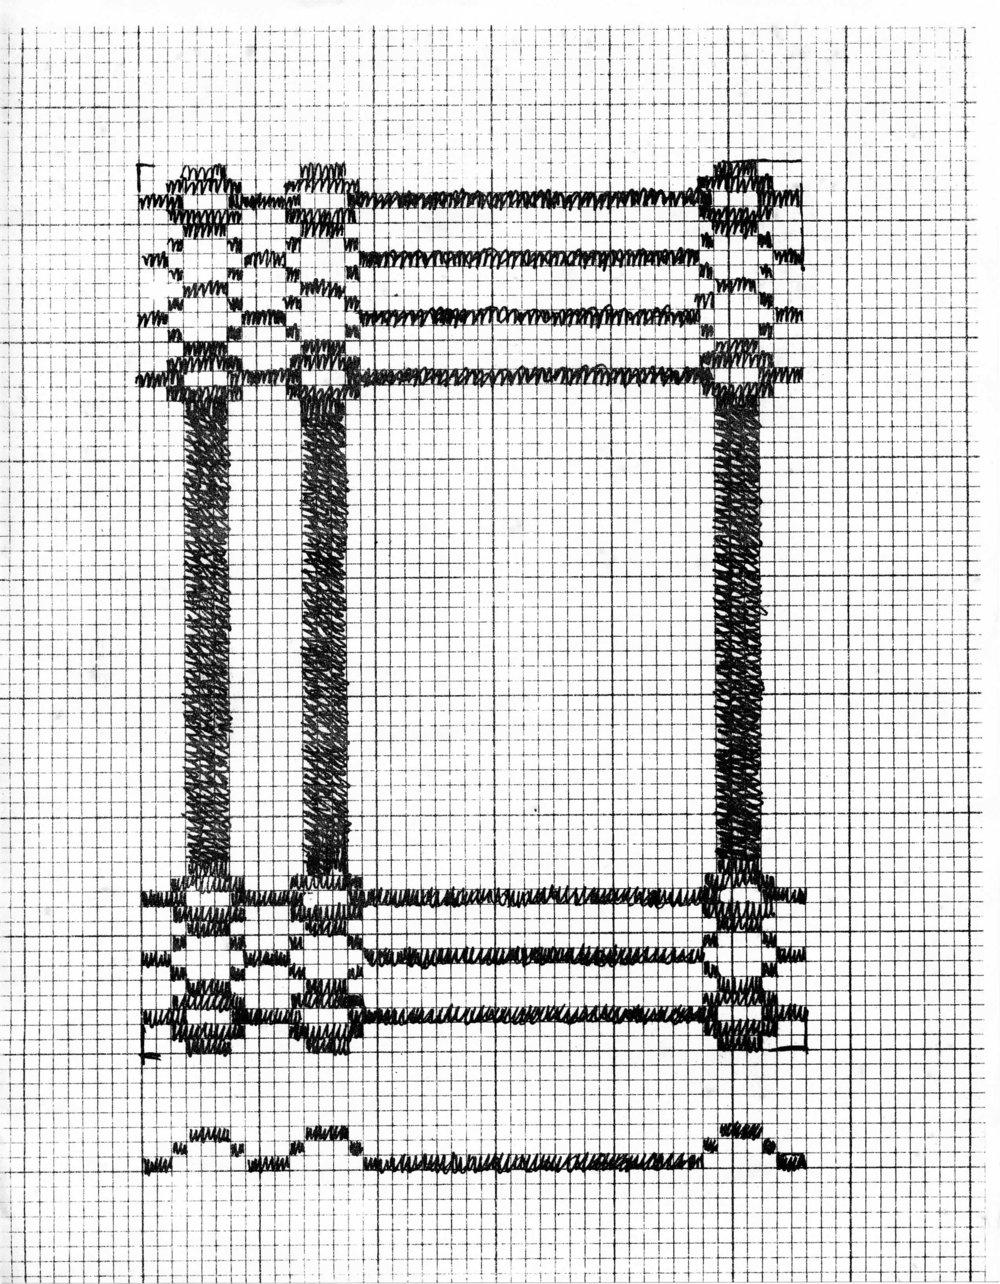 1981_Page_2_Image_0001.jpg